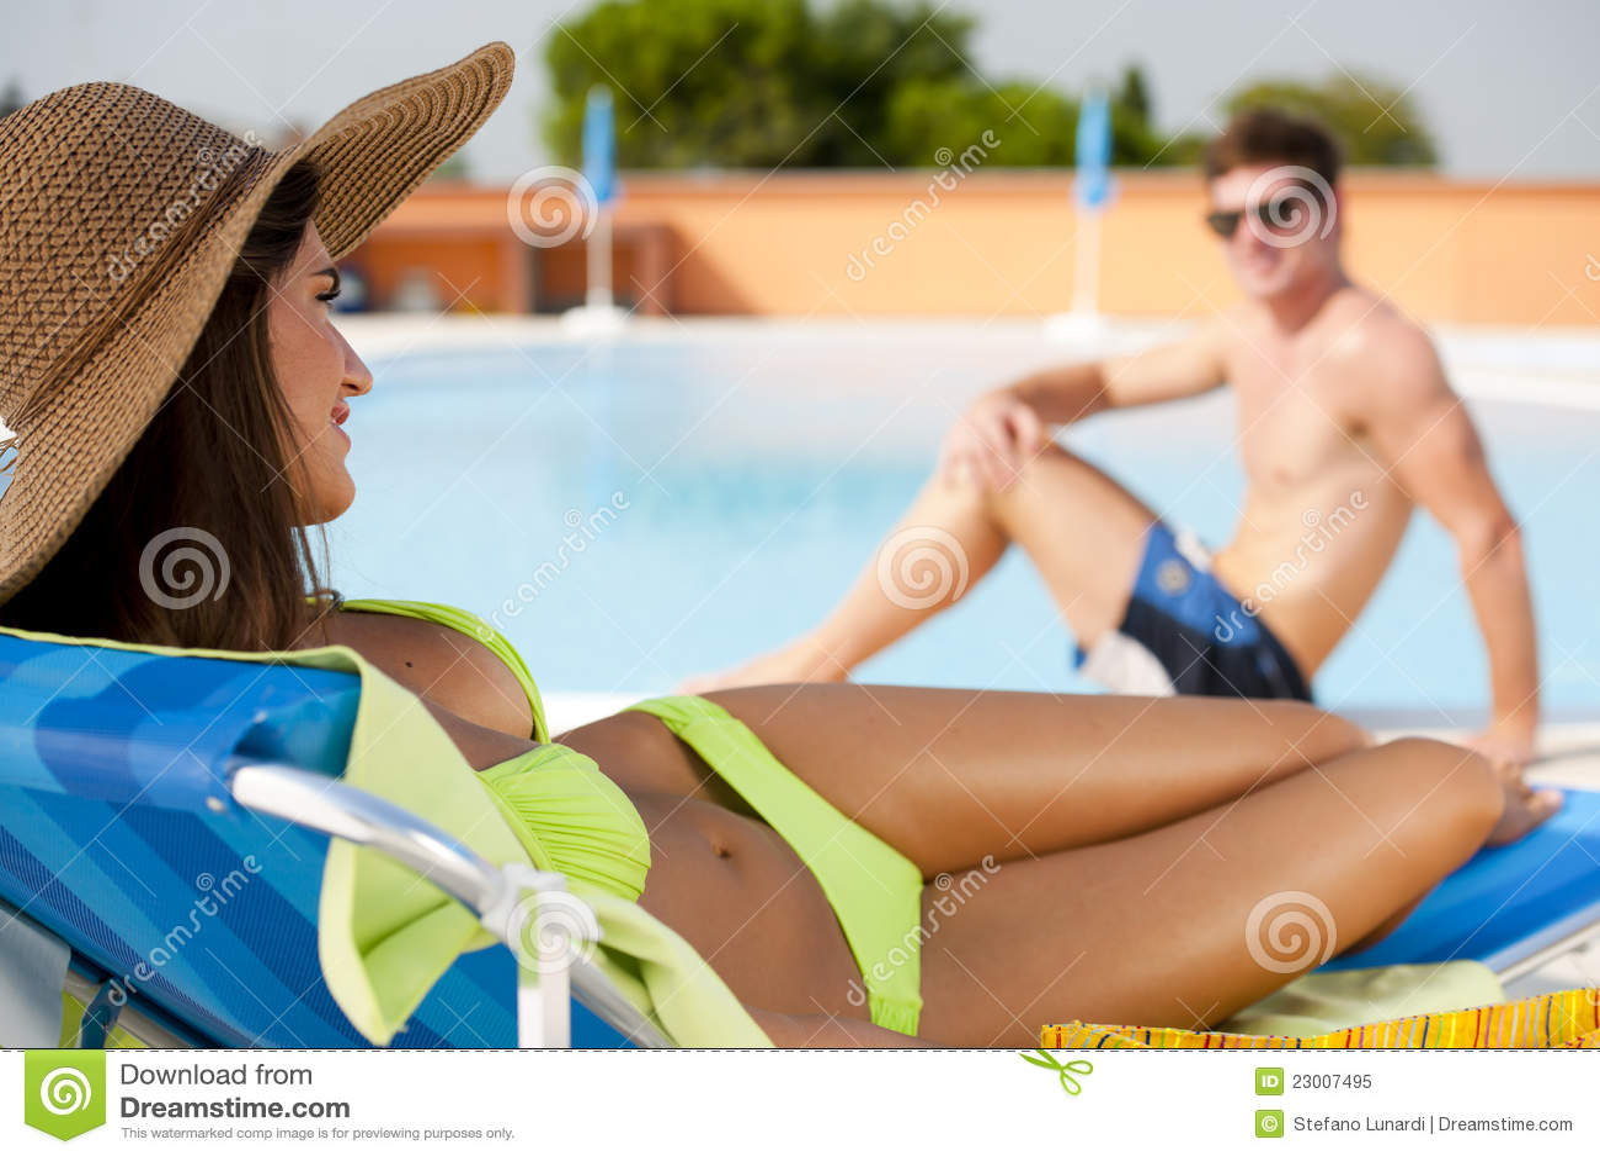 Bikini Pool Lounge Chairs Hot Girls Wallpaper